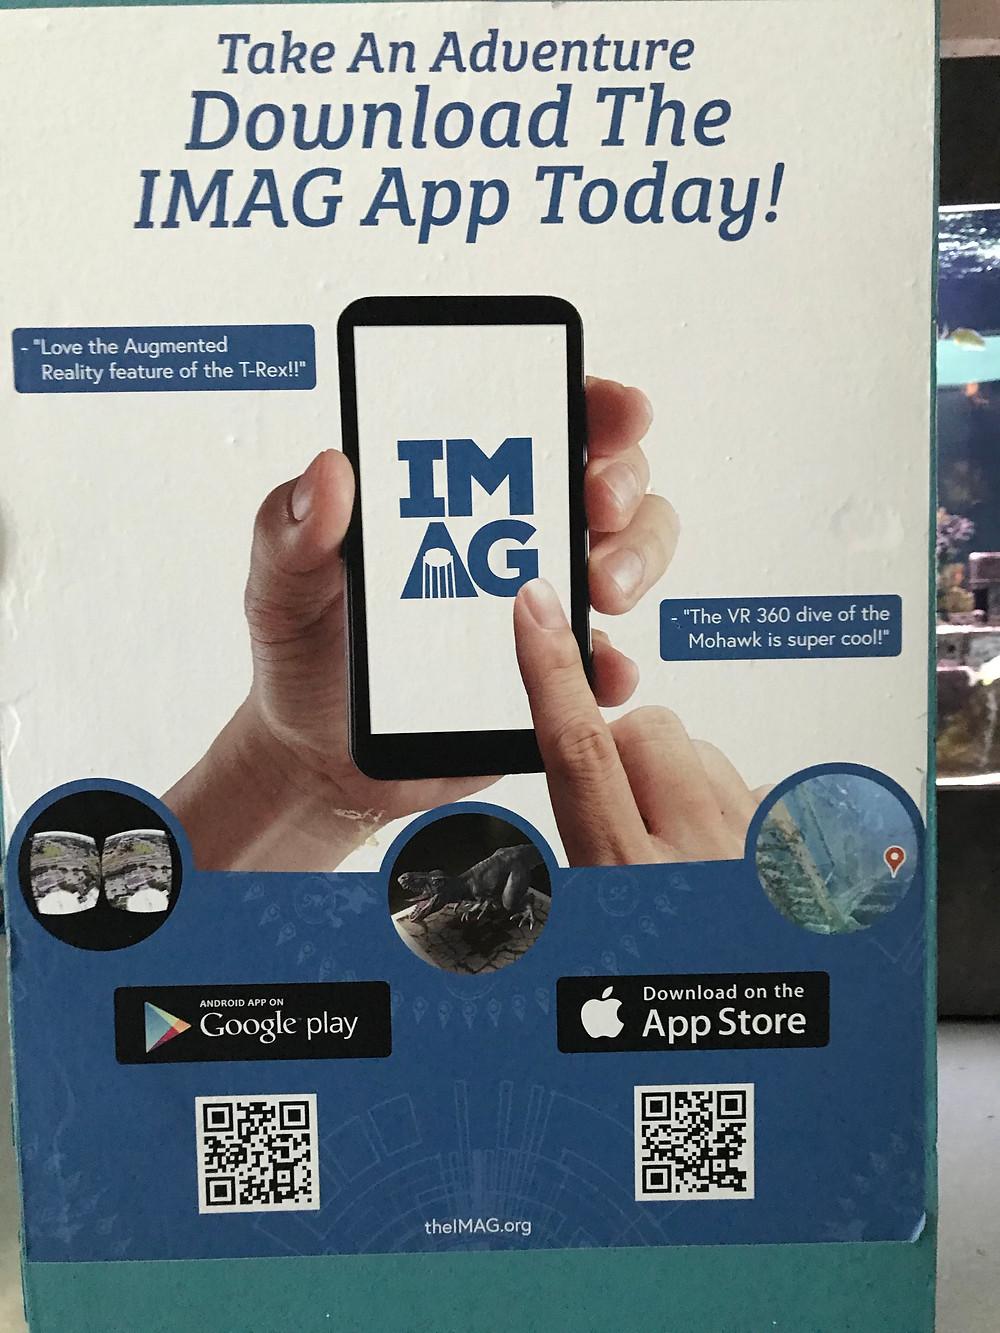 Download the IMAG App